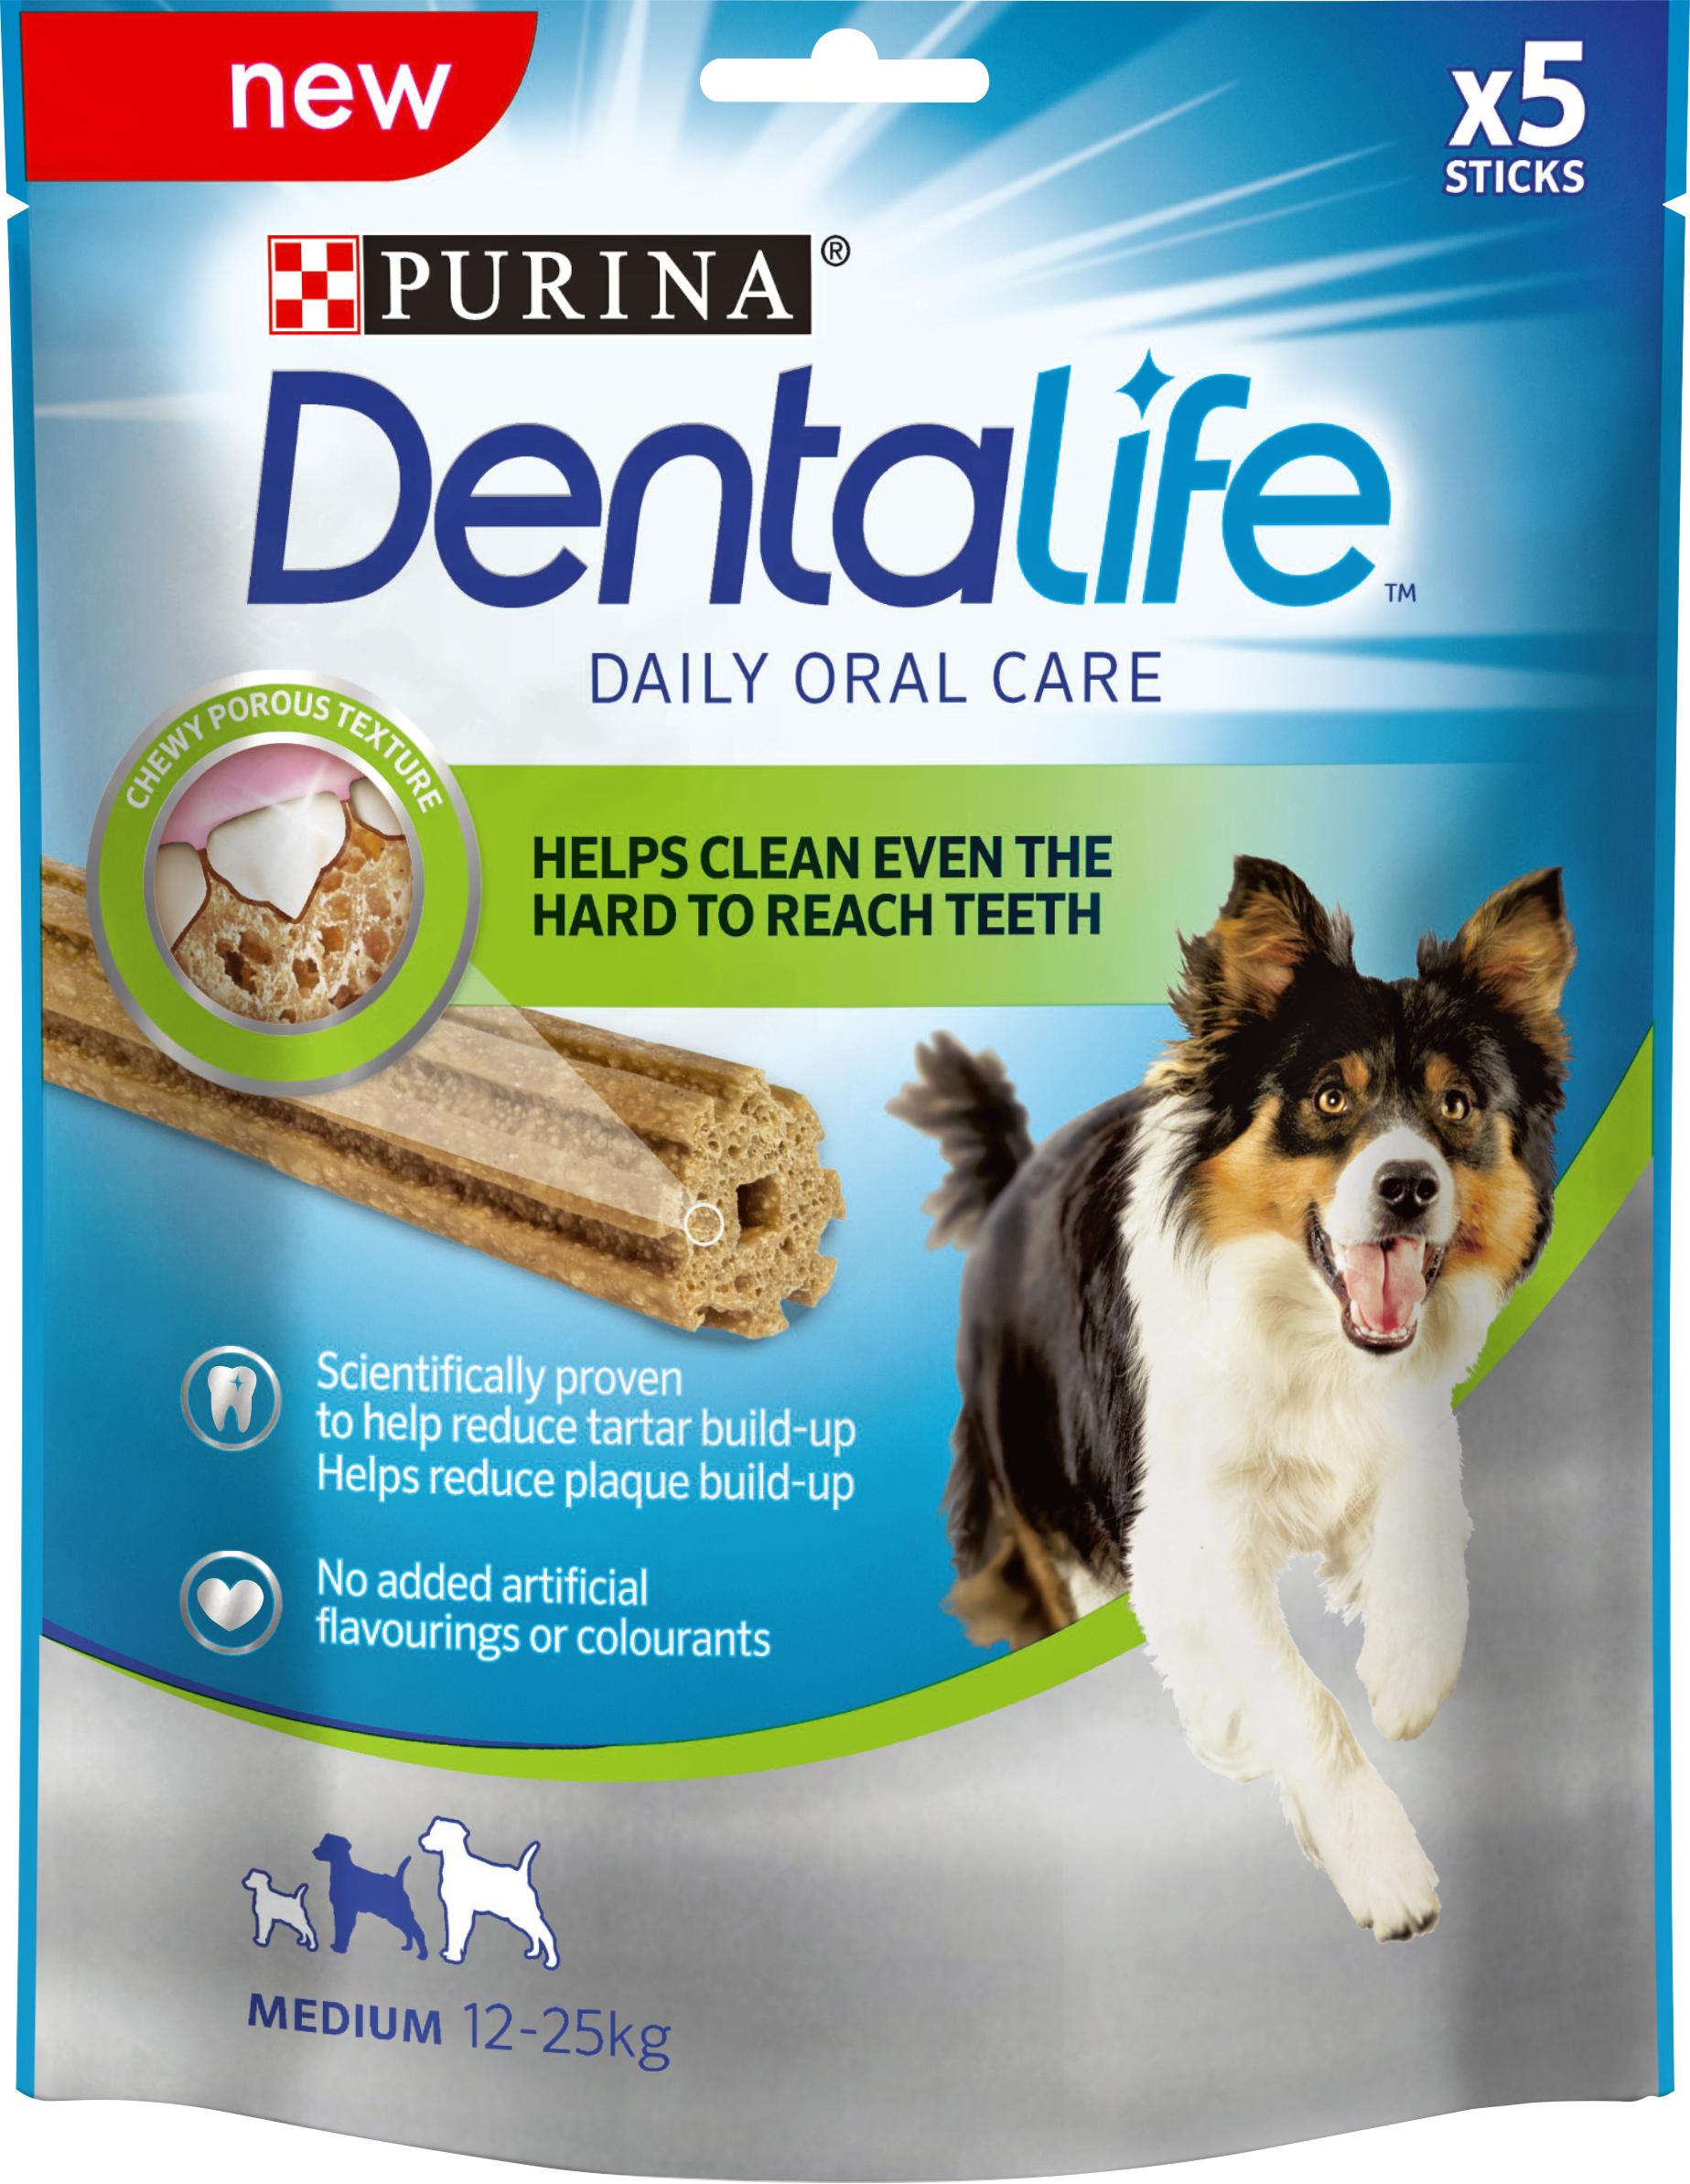 Hundtugg Purina DentaLife Medium